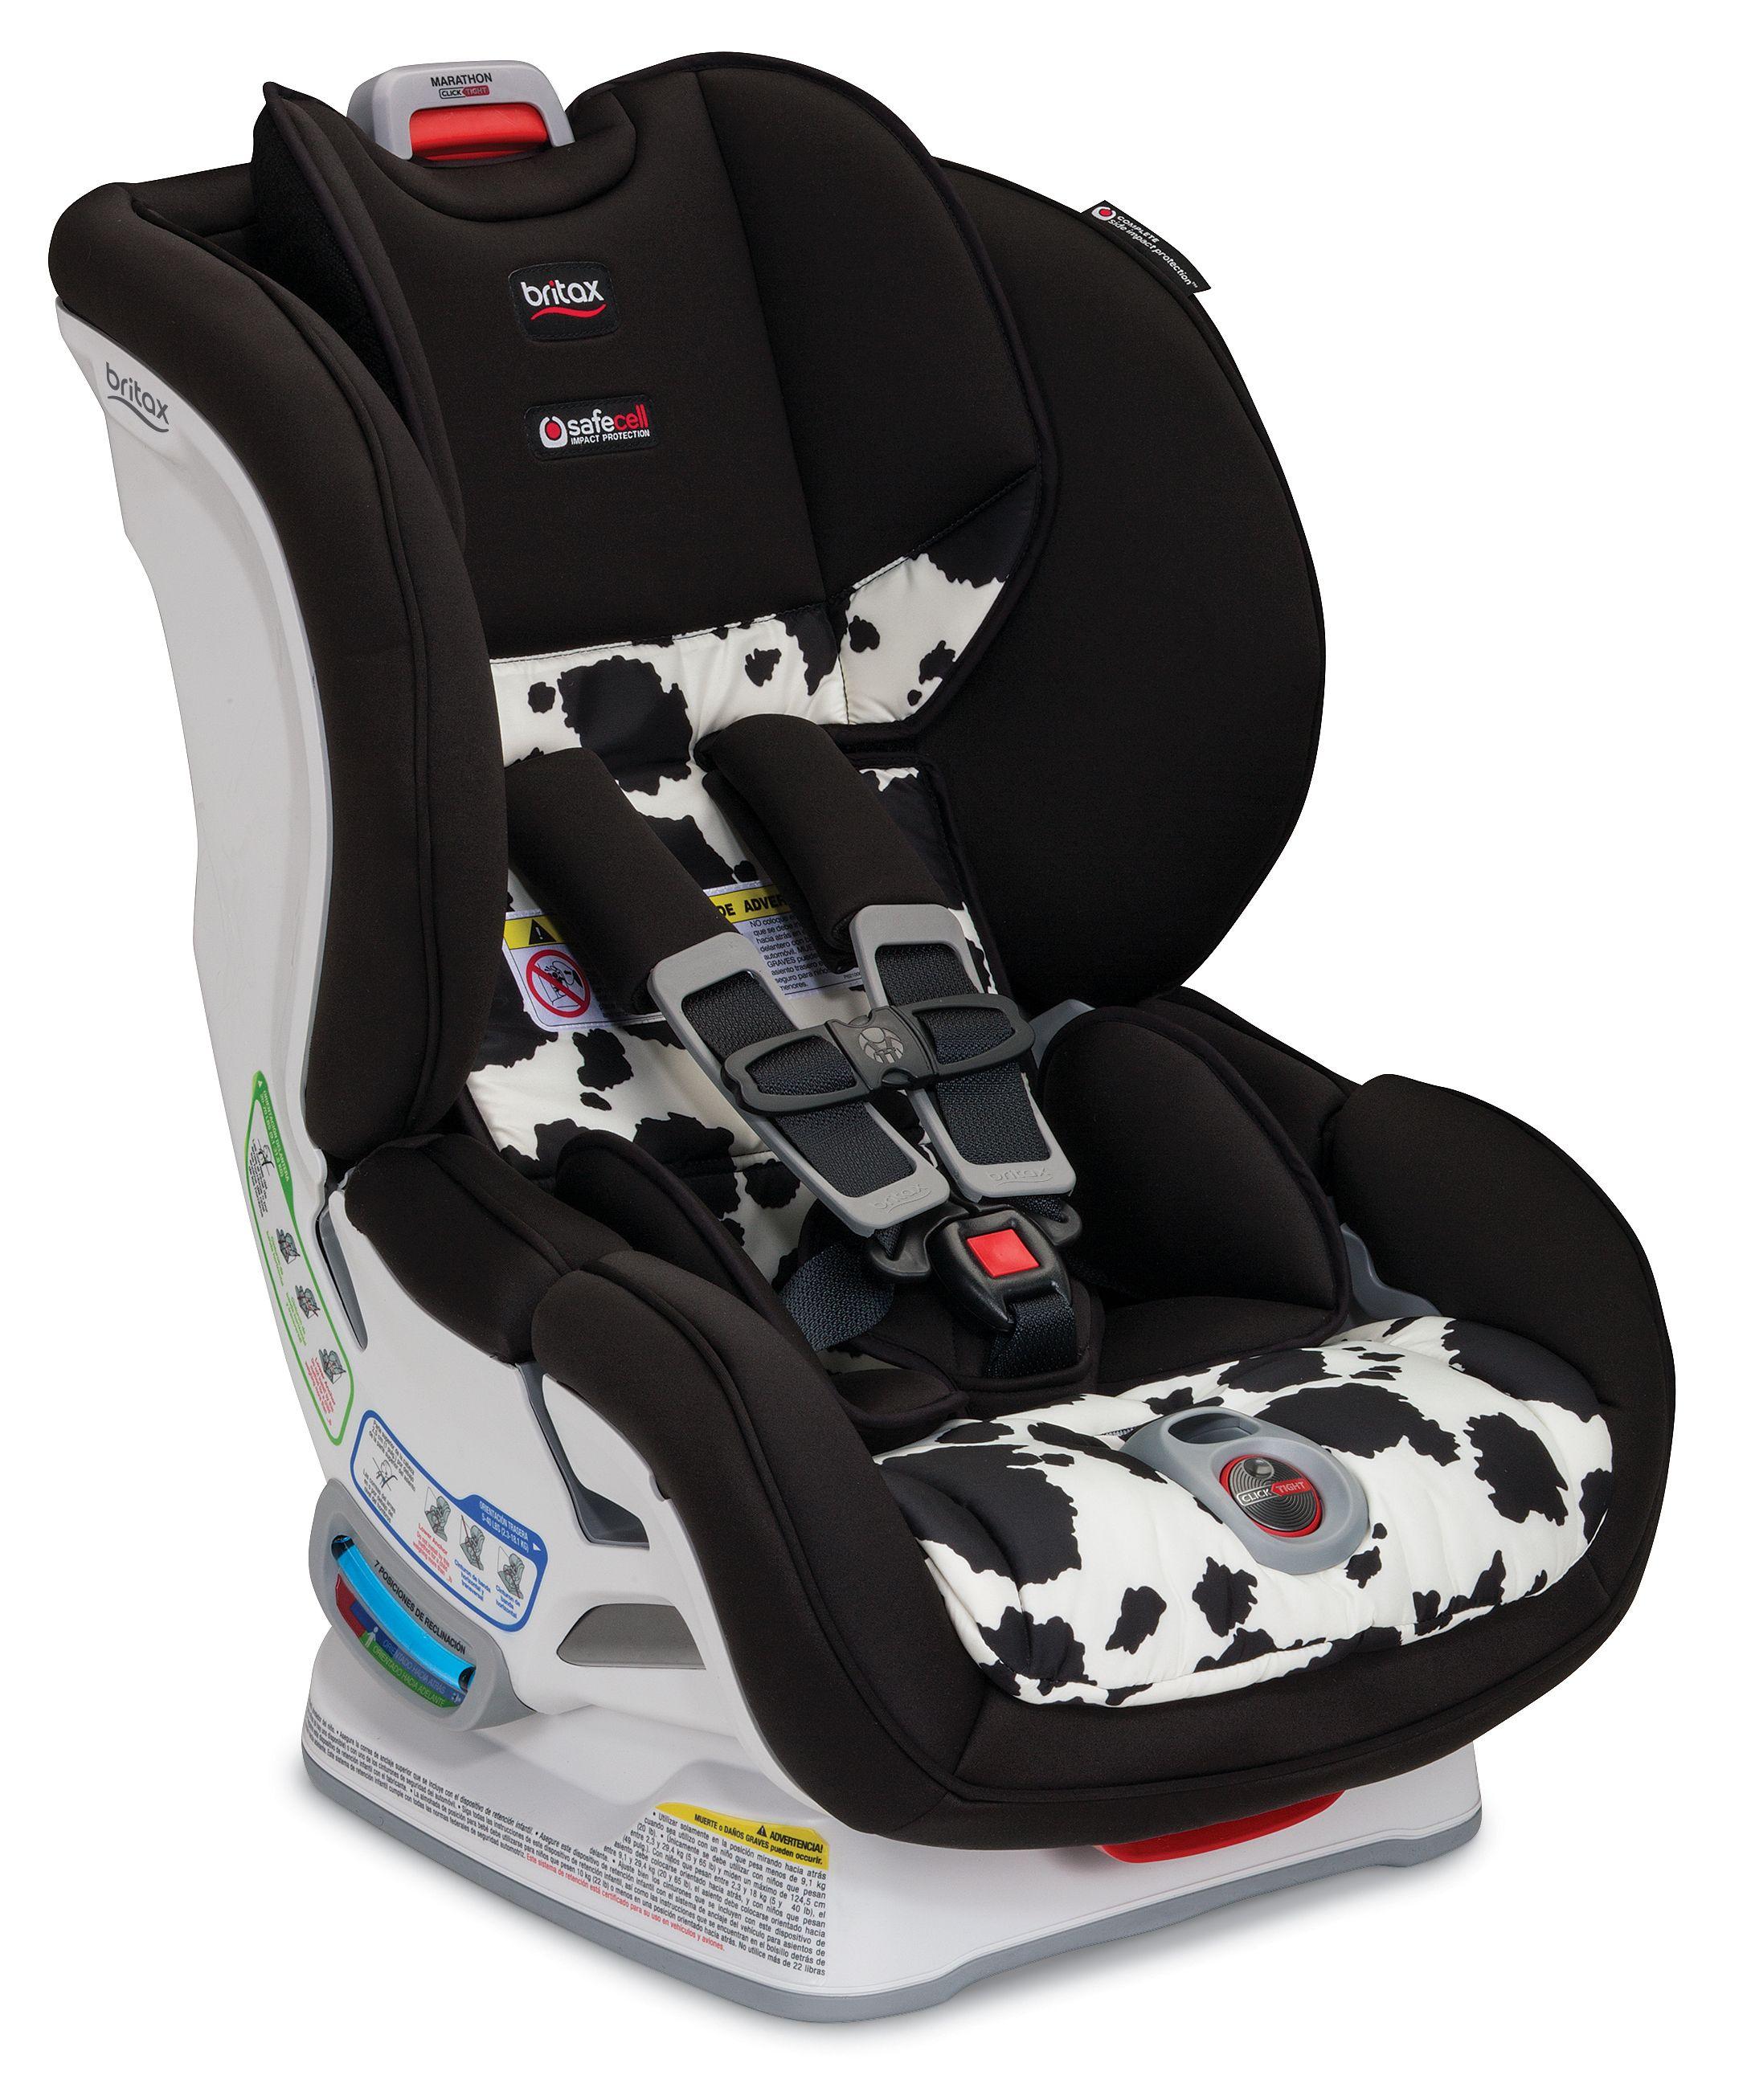 Britax S Game Changer Clicktight Installation Comes To Their Convertible Car Seats Car Seats Britax Marathon Baby Car Seats